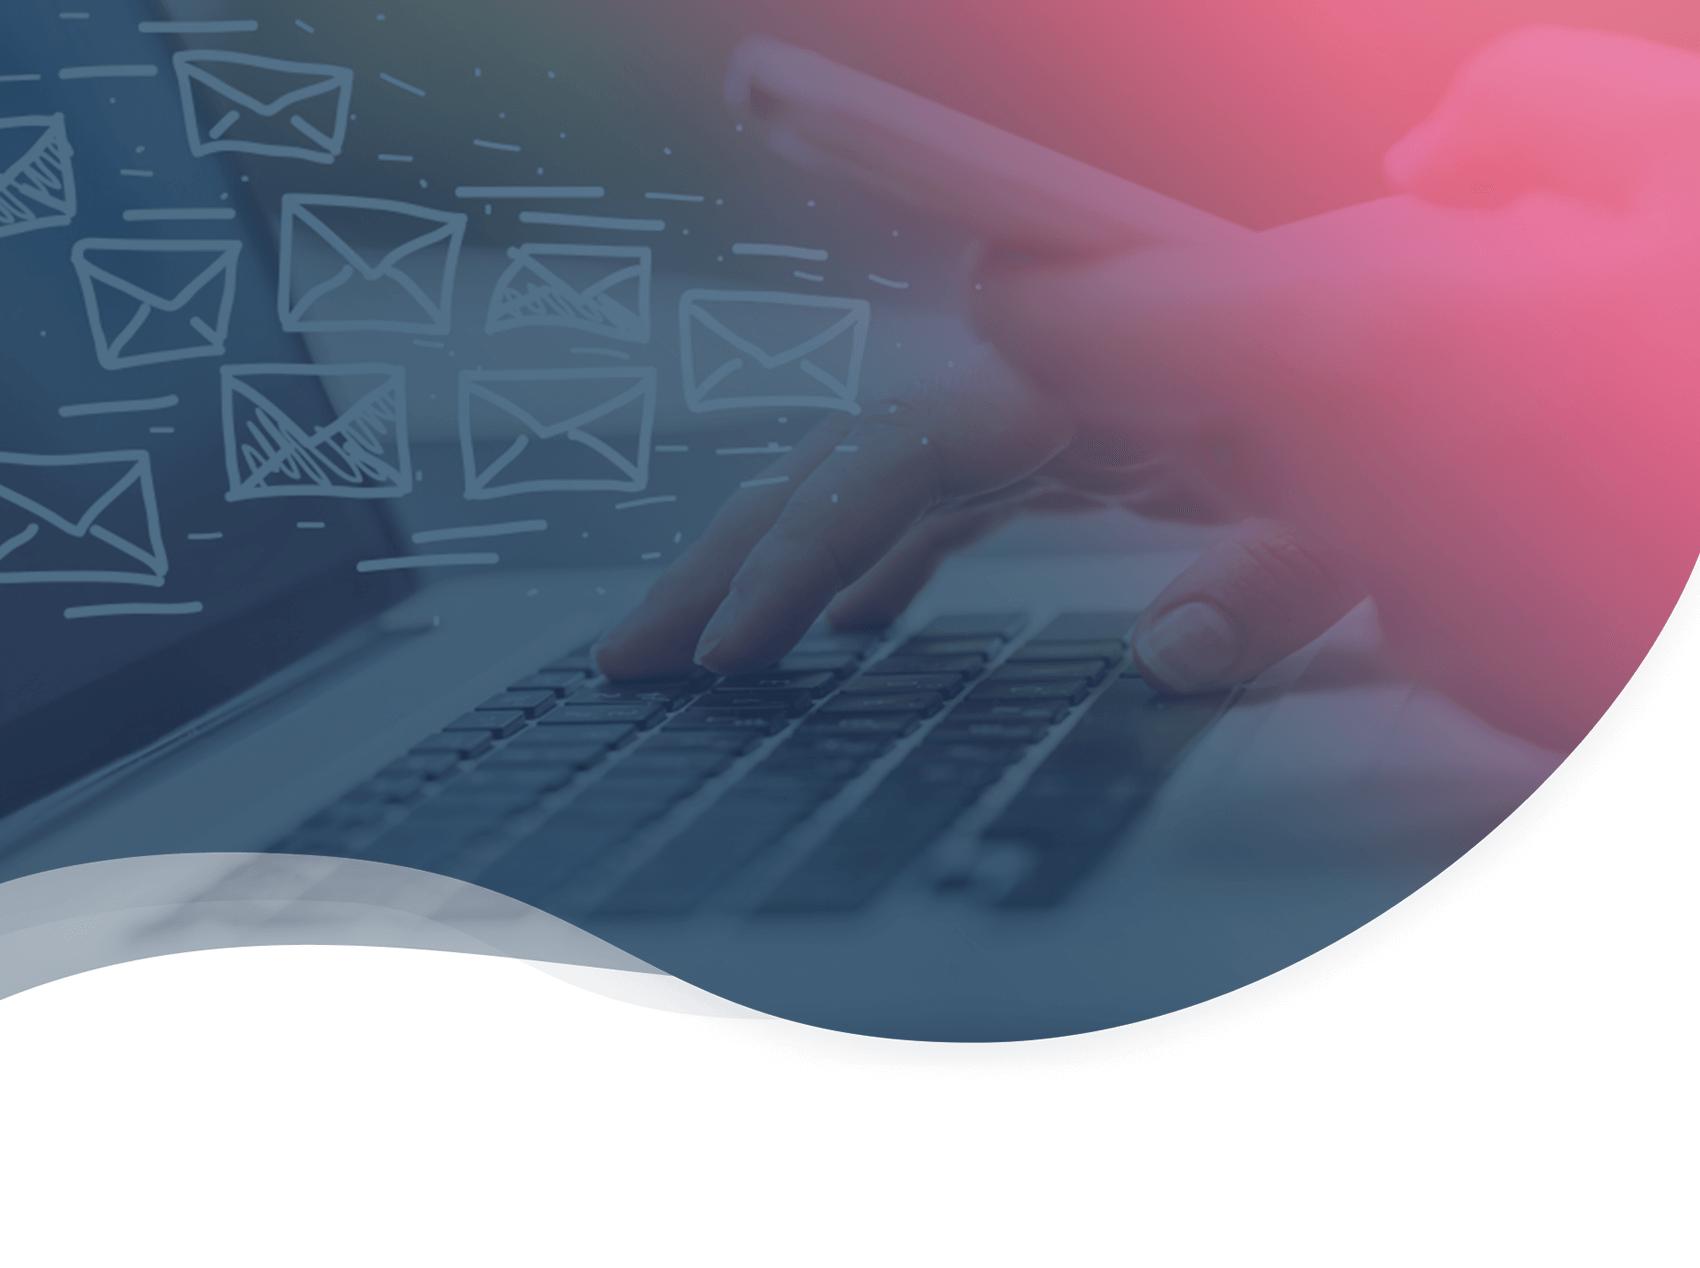 10 conseils imparables pour optimiser une campagne emailing